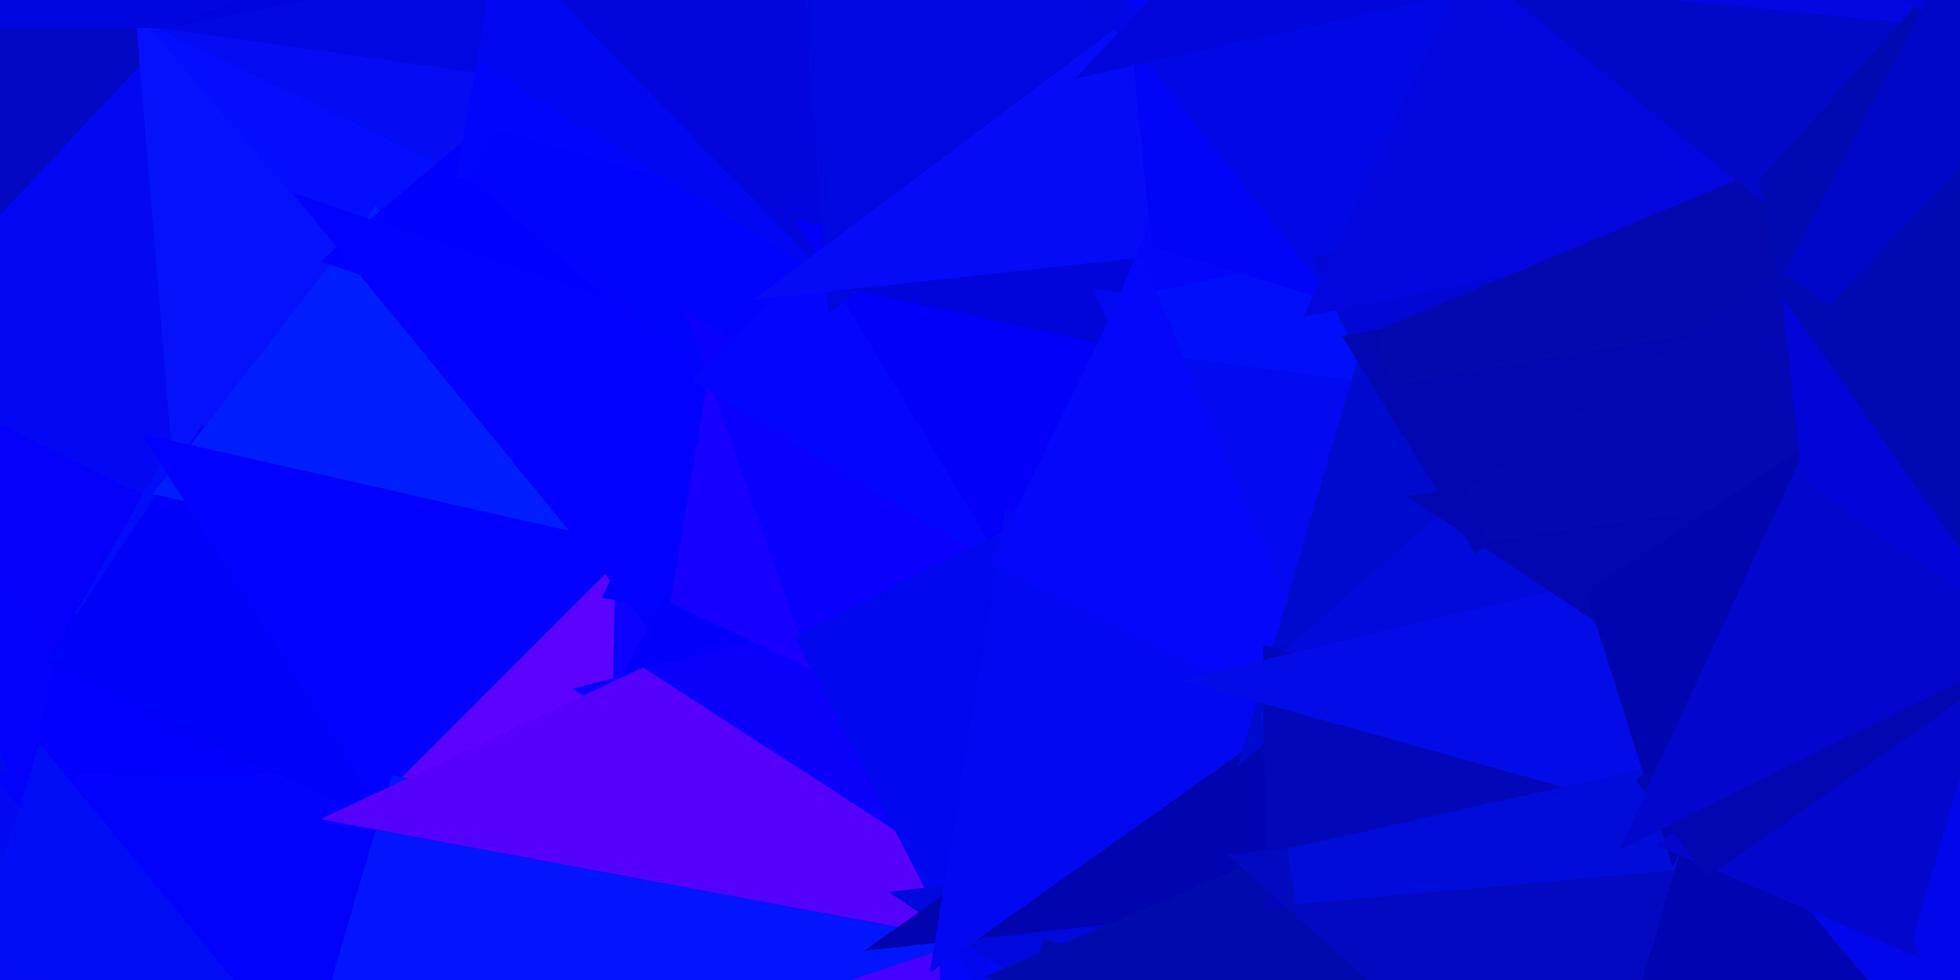 motif de mosaïque triangle vecteur bleu foncé.